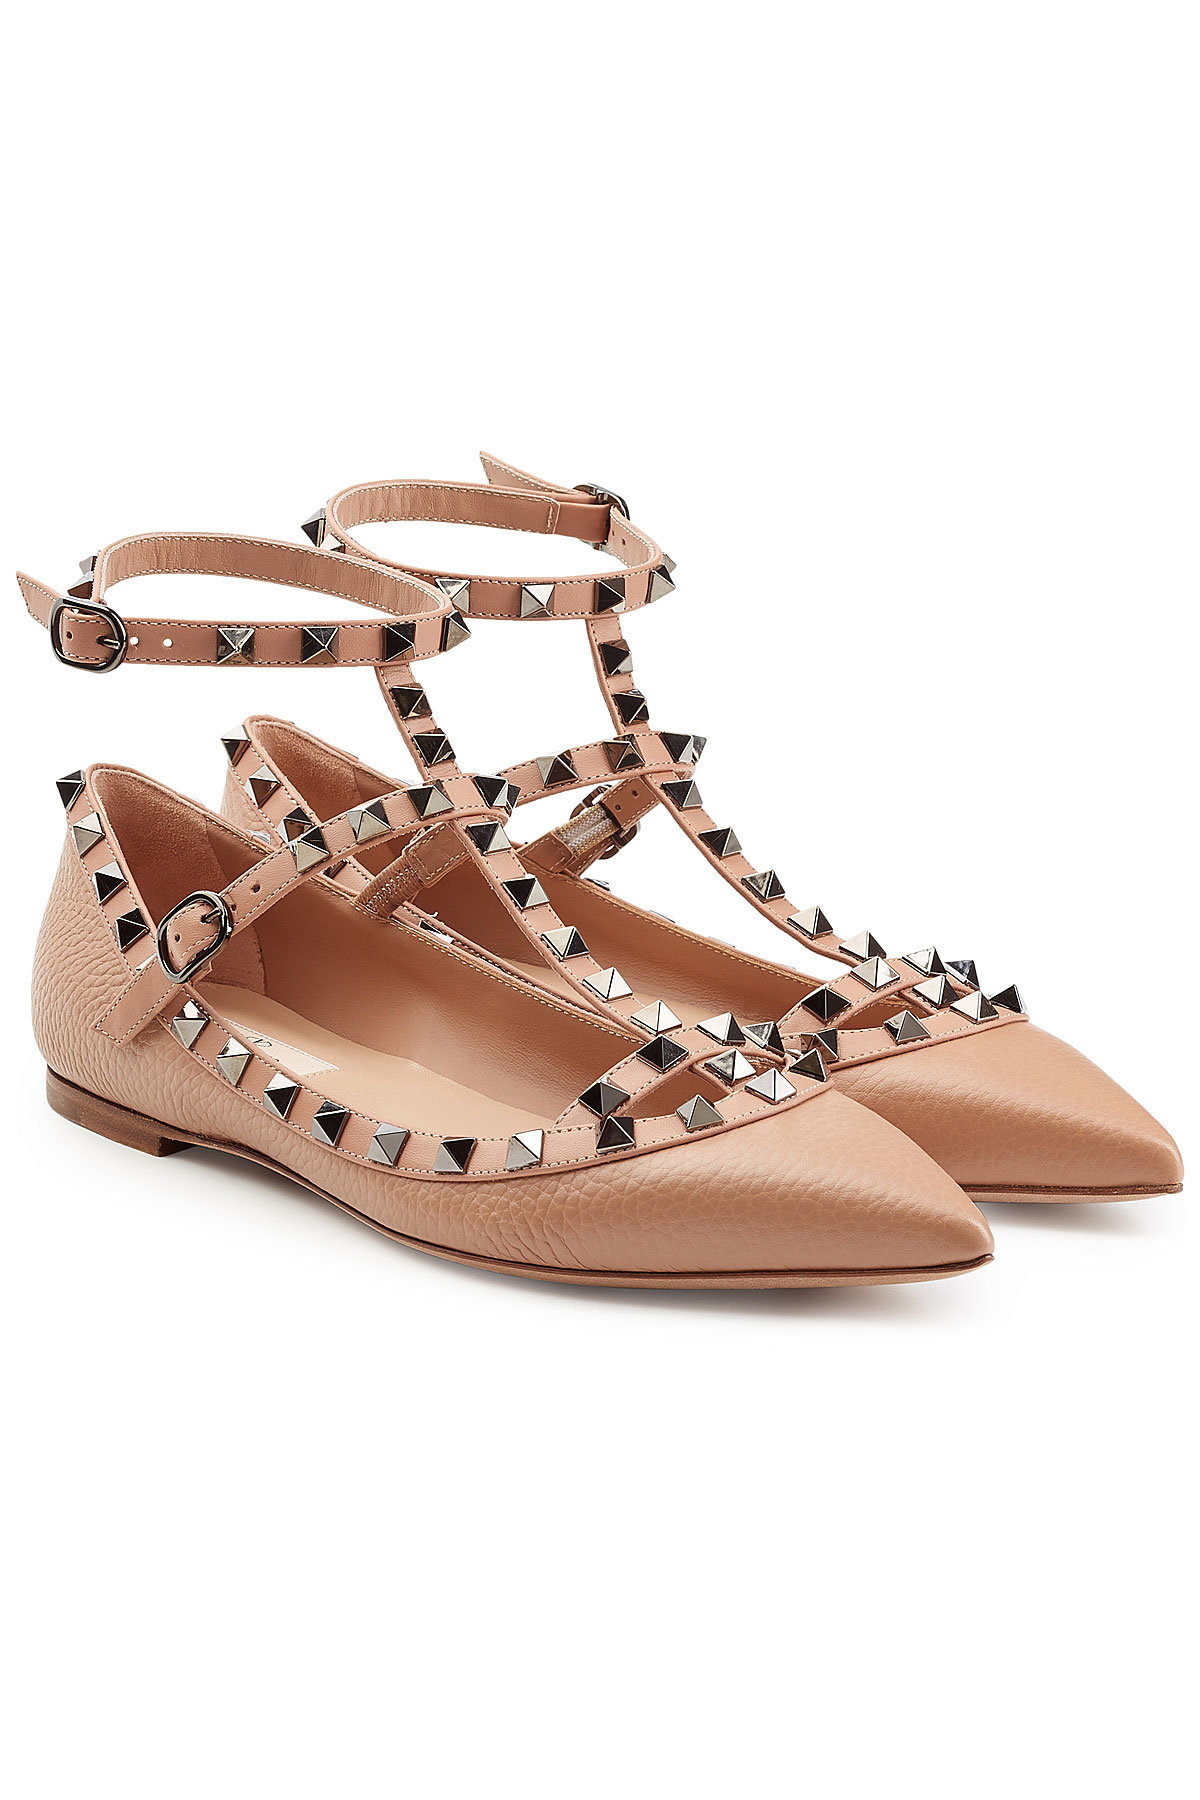 Valentino Rockstud Textured Leather Ballerinas Gr. IT 39 rh1mnGw8K